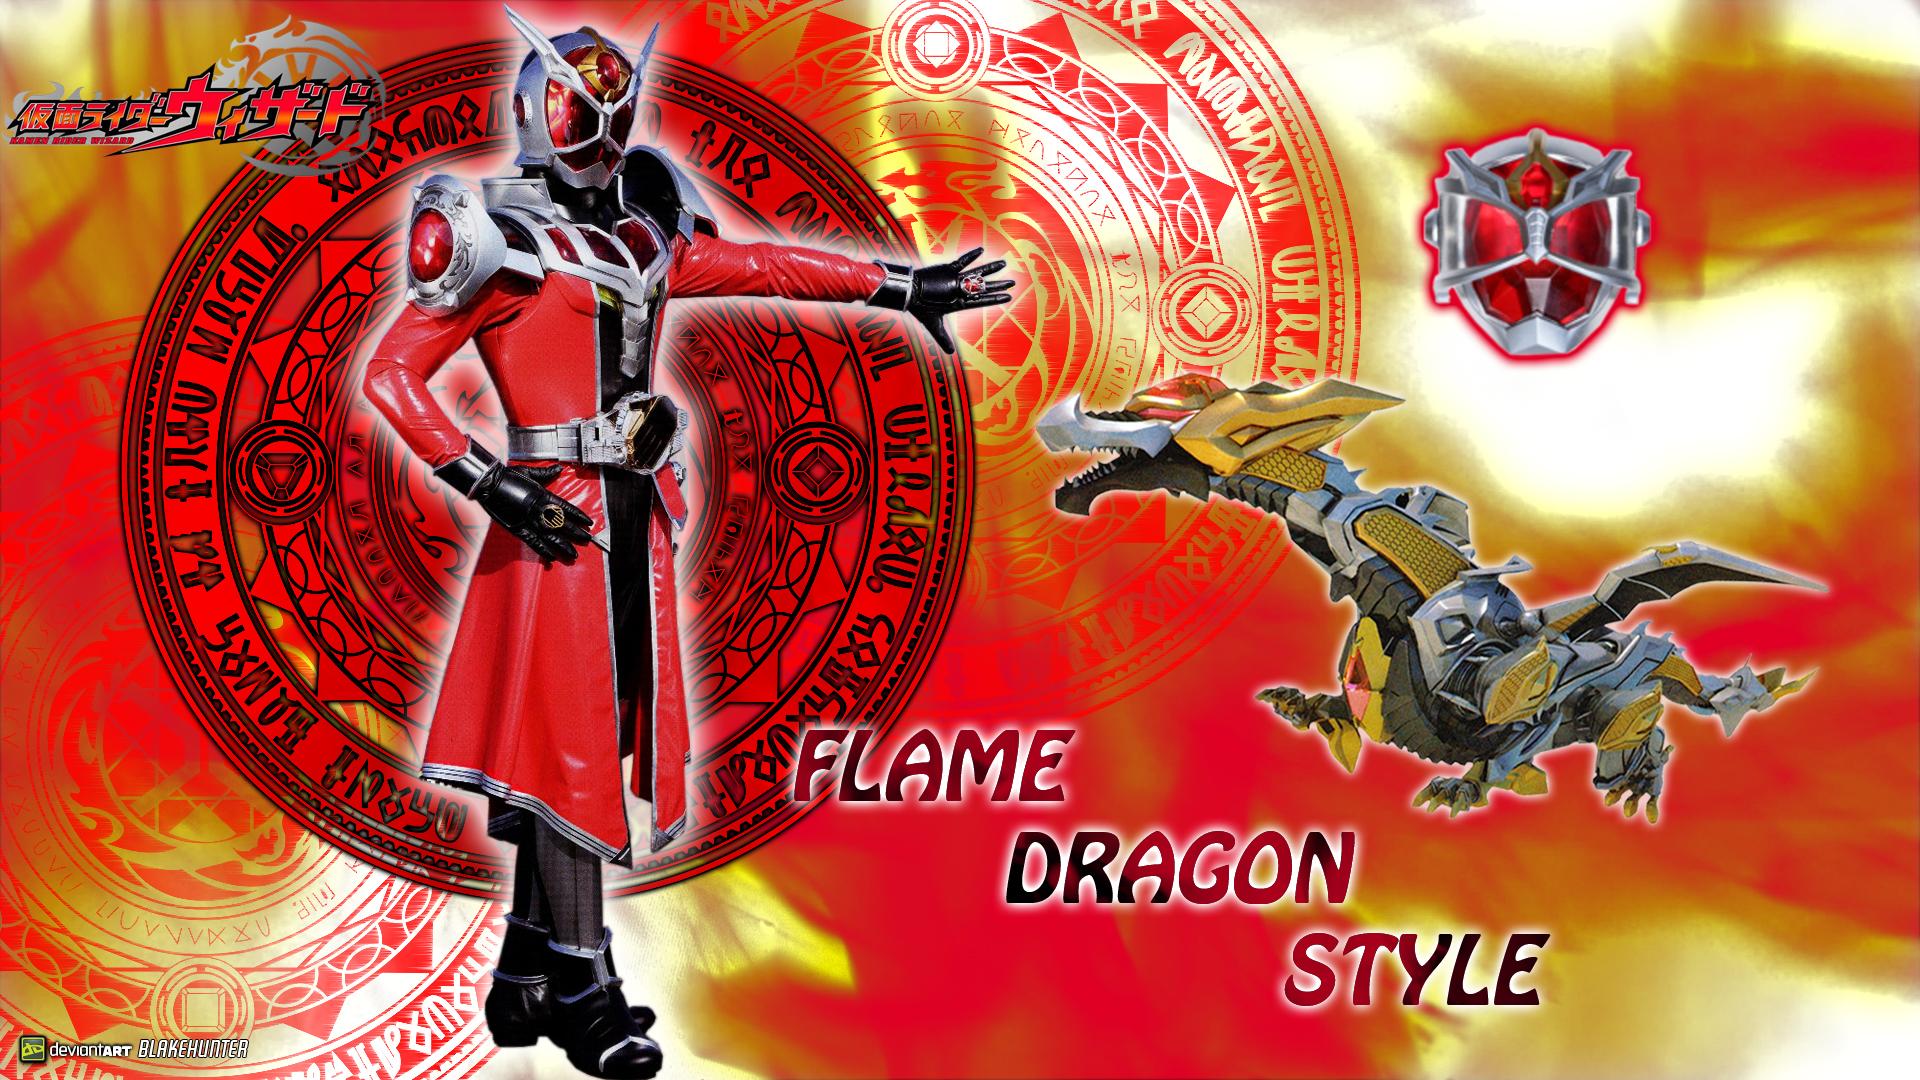 KR Wizard Flame Dragon Style by blakehunter